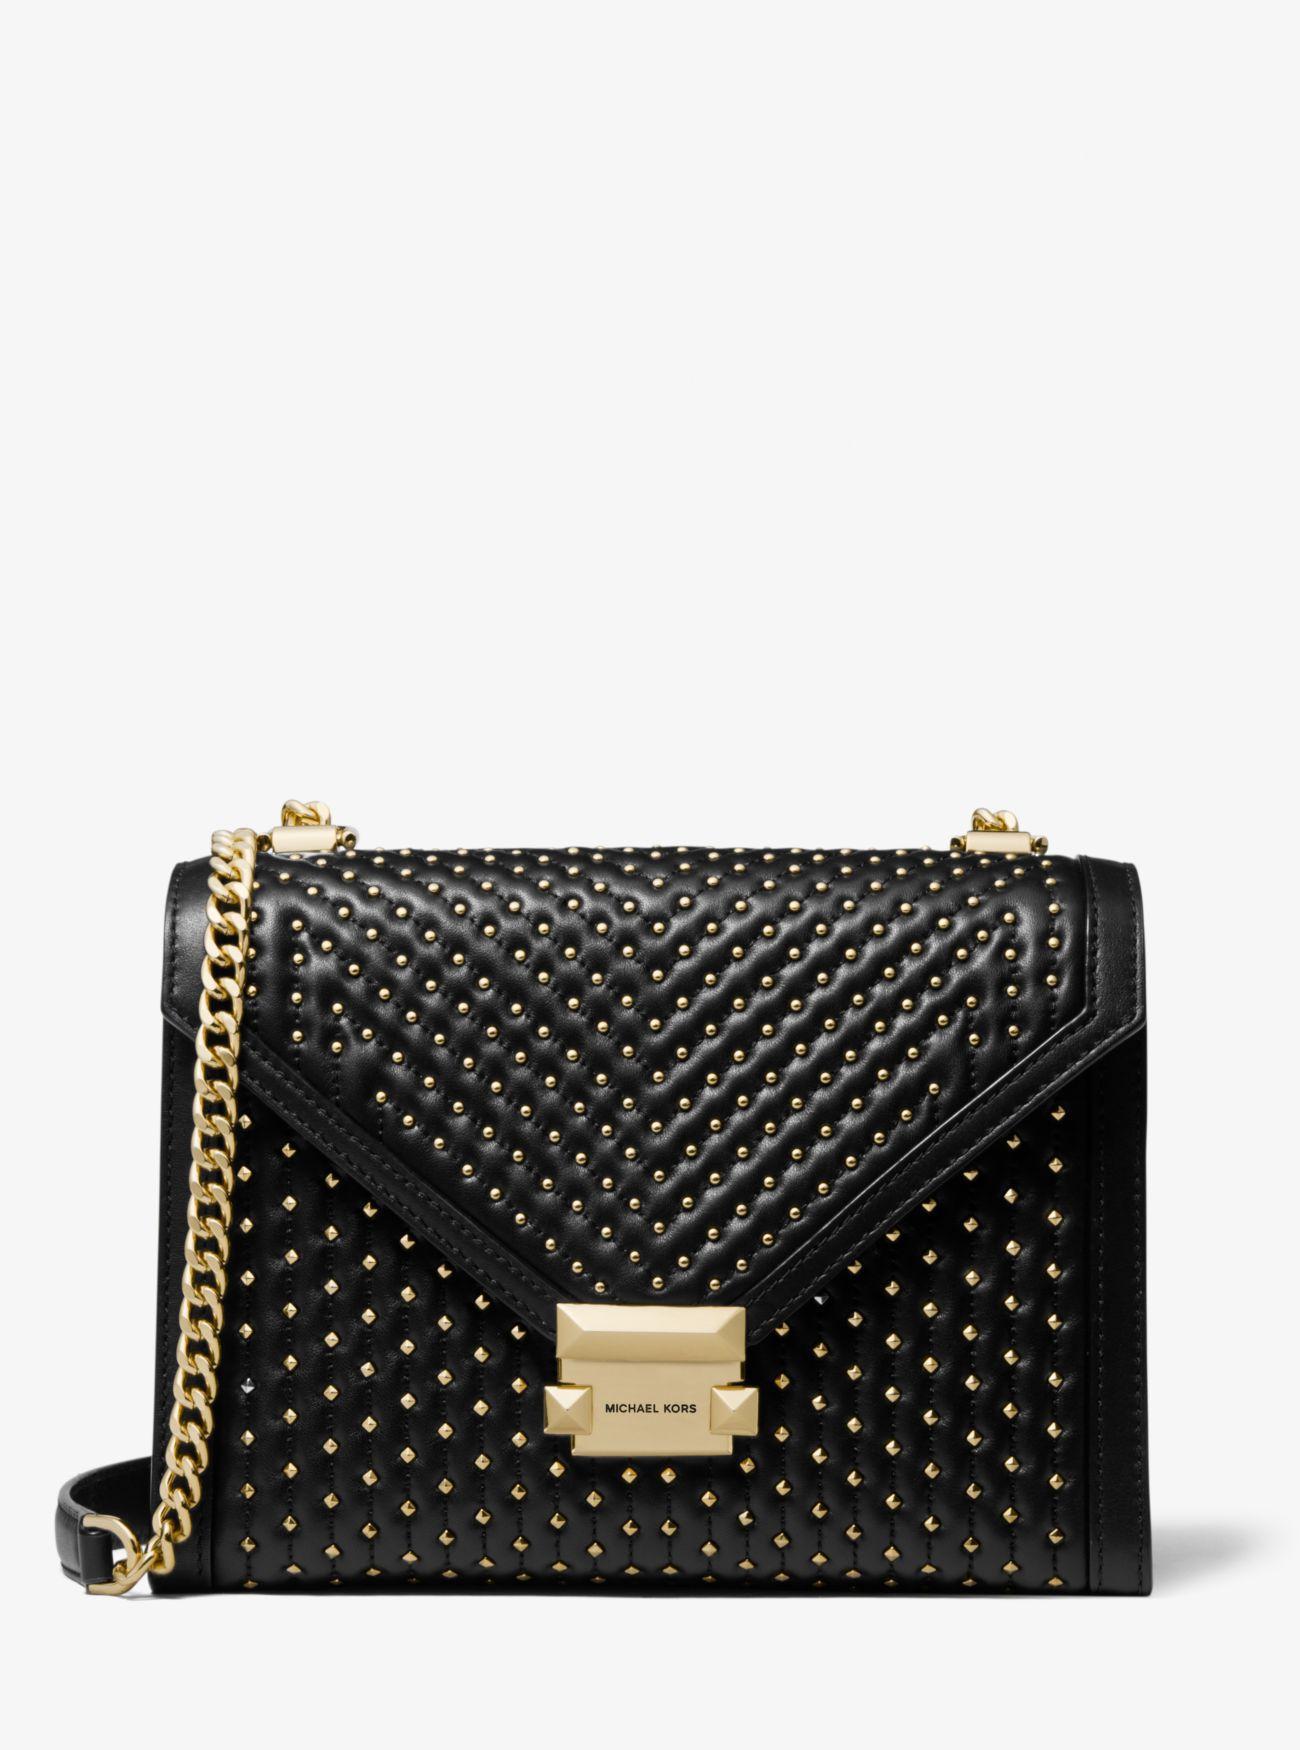 480eb6bb91d13 Michael Kors - Black Whitney Large Studded Leather Convertible Shoulder Bag  - Lyst. View fullscreen